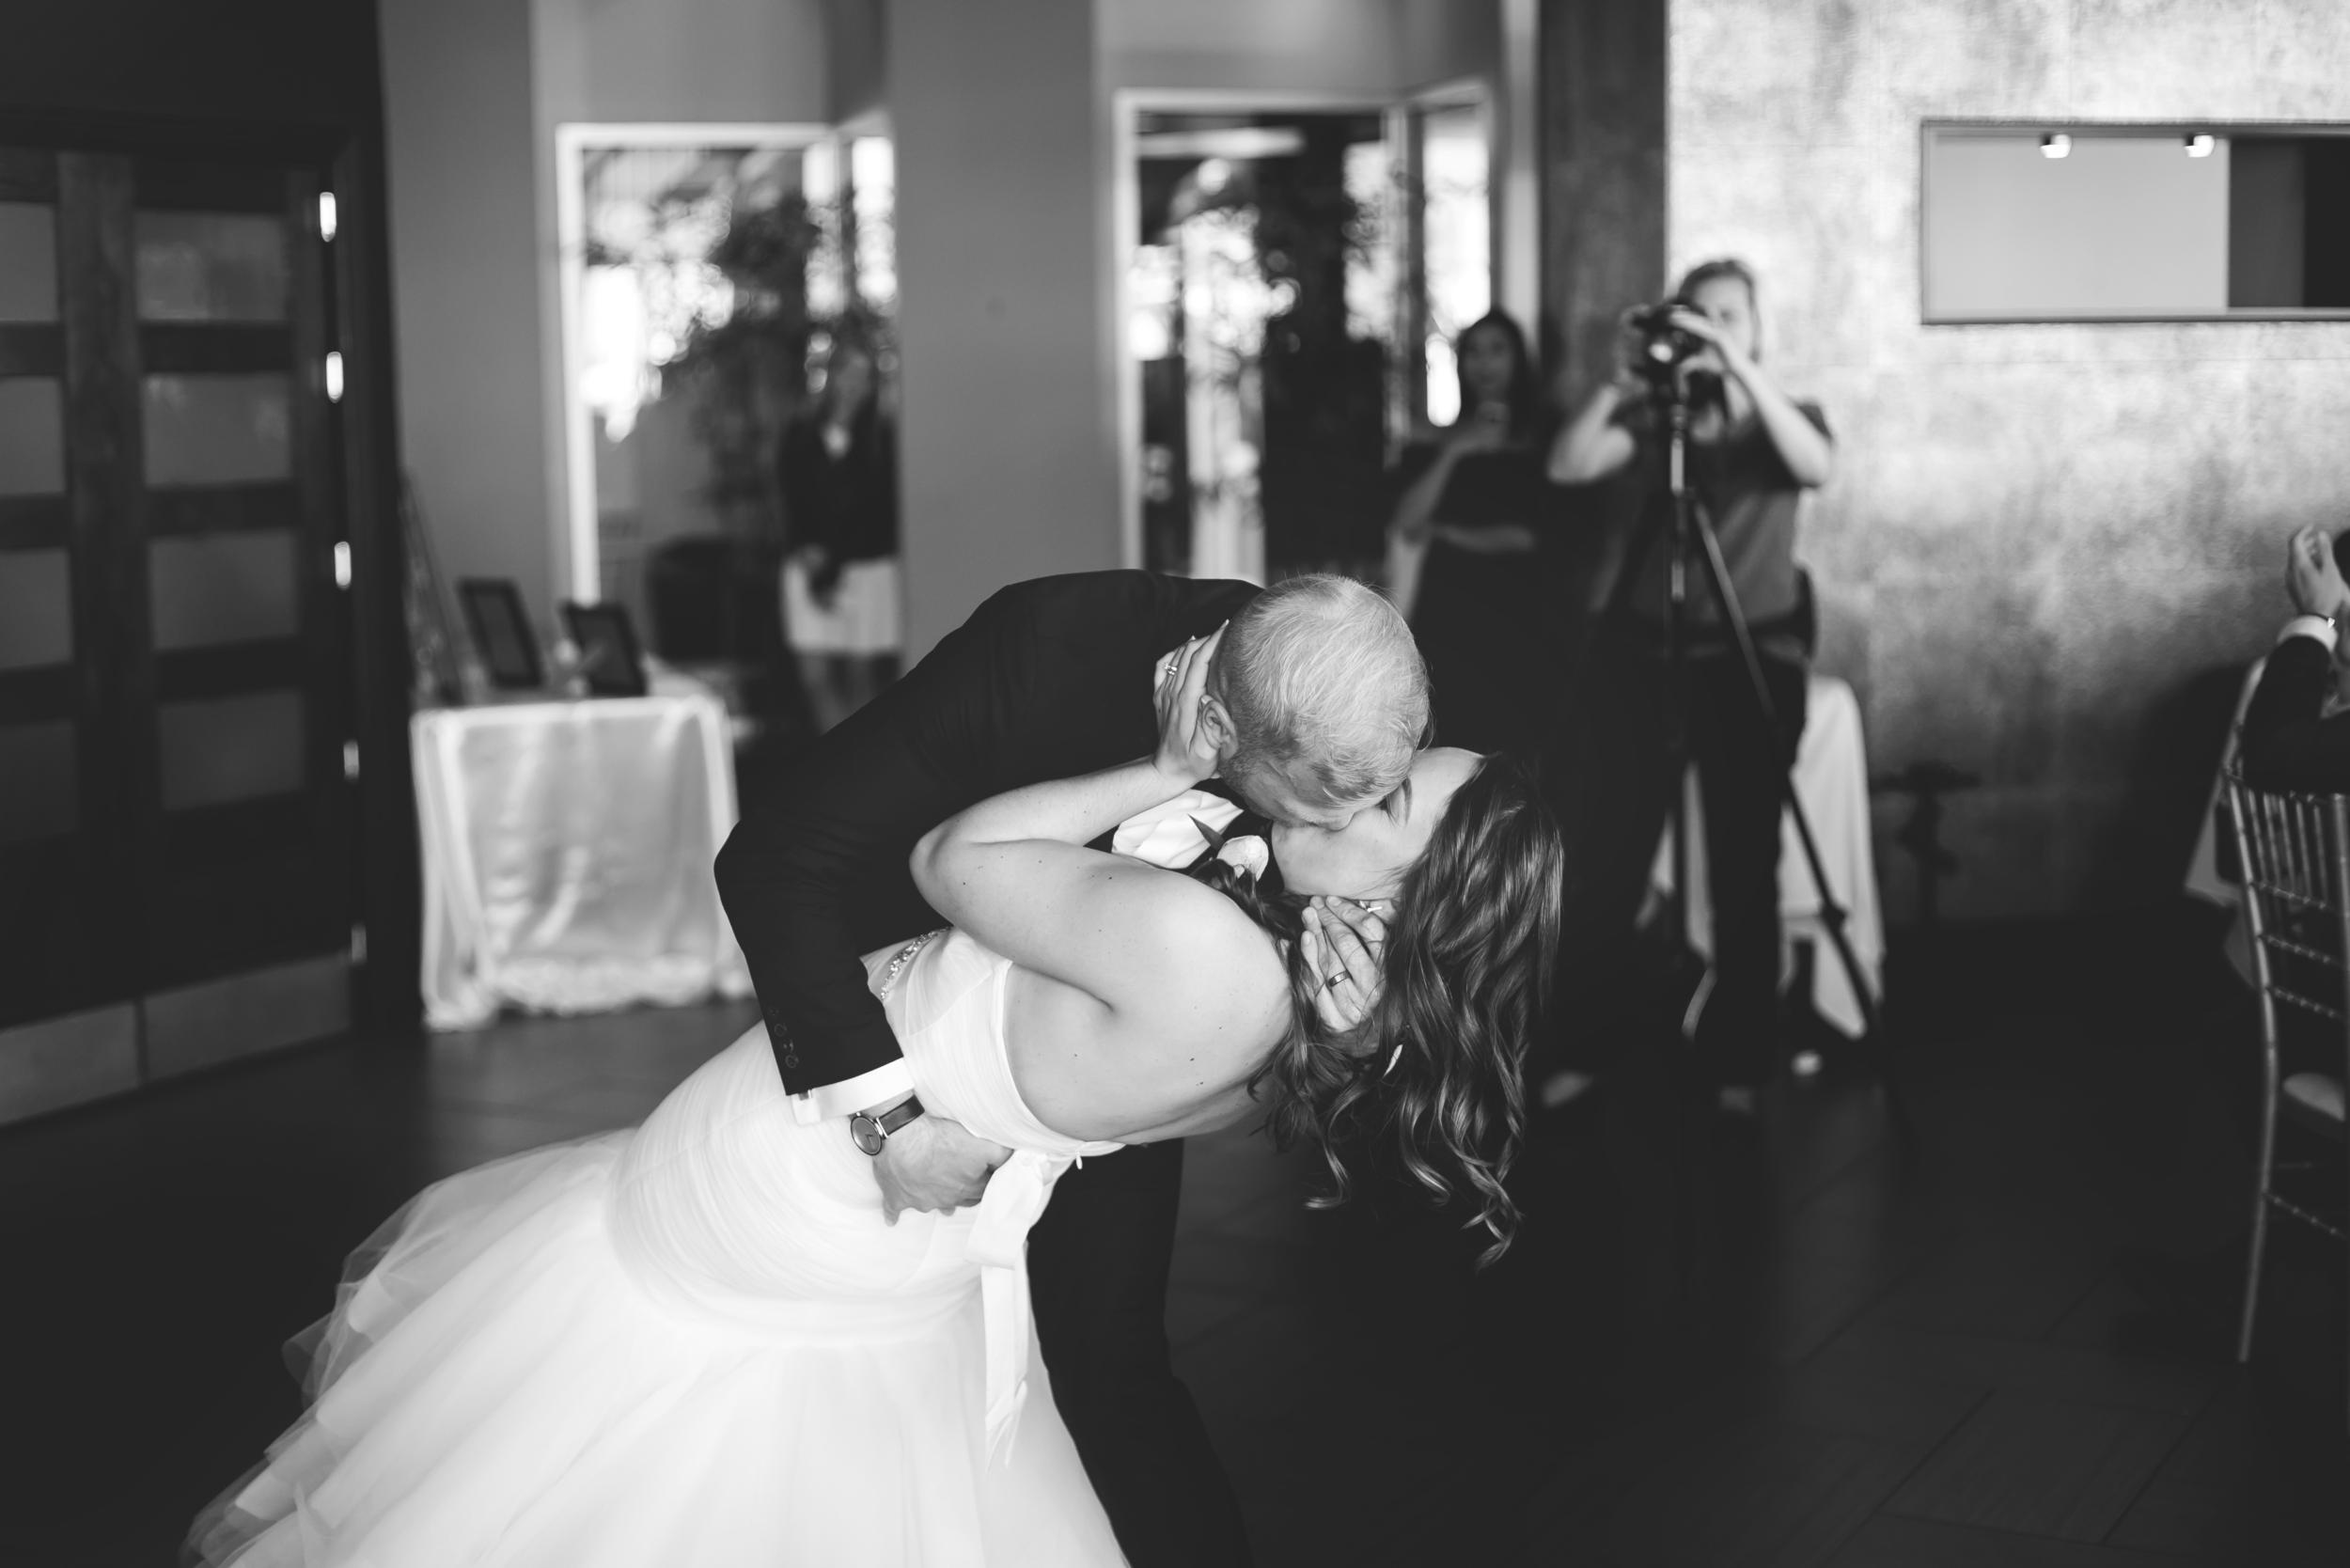 Wedding-Harbour-Banquet-Center-Oakville-Photographer-Wedding-Hamilton-Saint-James-Espresso-Downtown-HamOnt-GTA-Niagara-Toronto-Moments-by-Lauren-Photography-Photo-Image-56.png